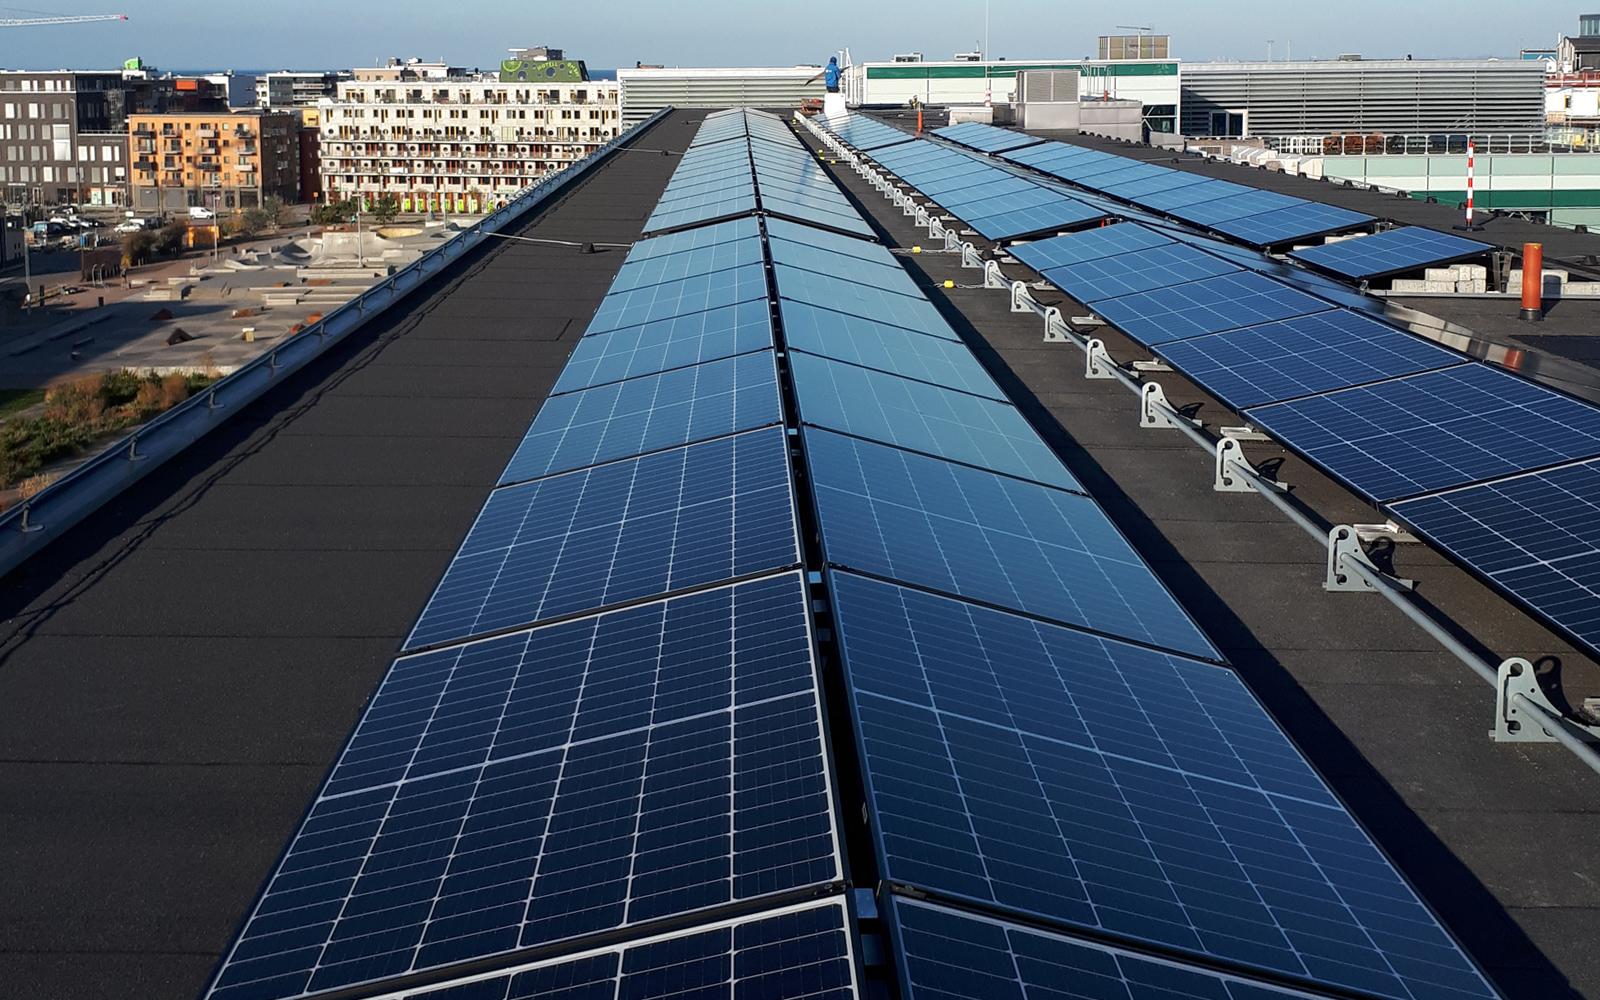 solpaneler i rad på tak